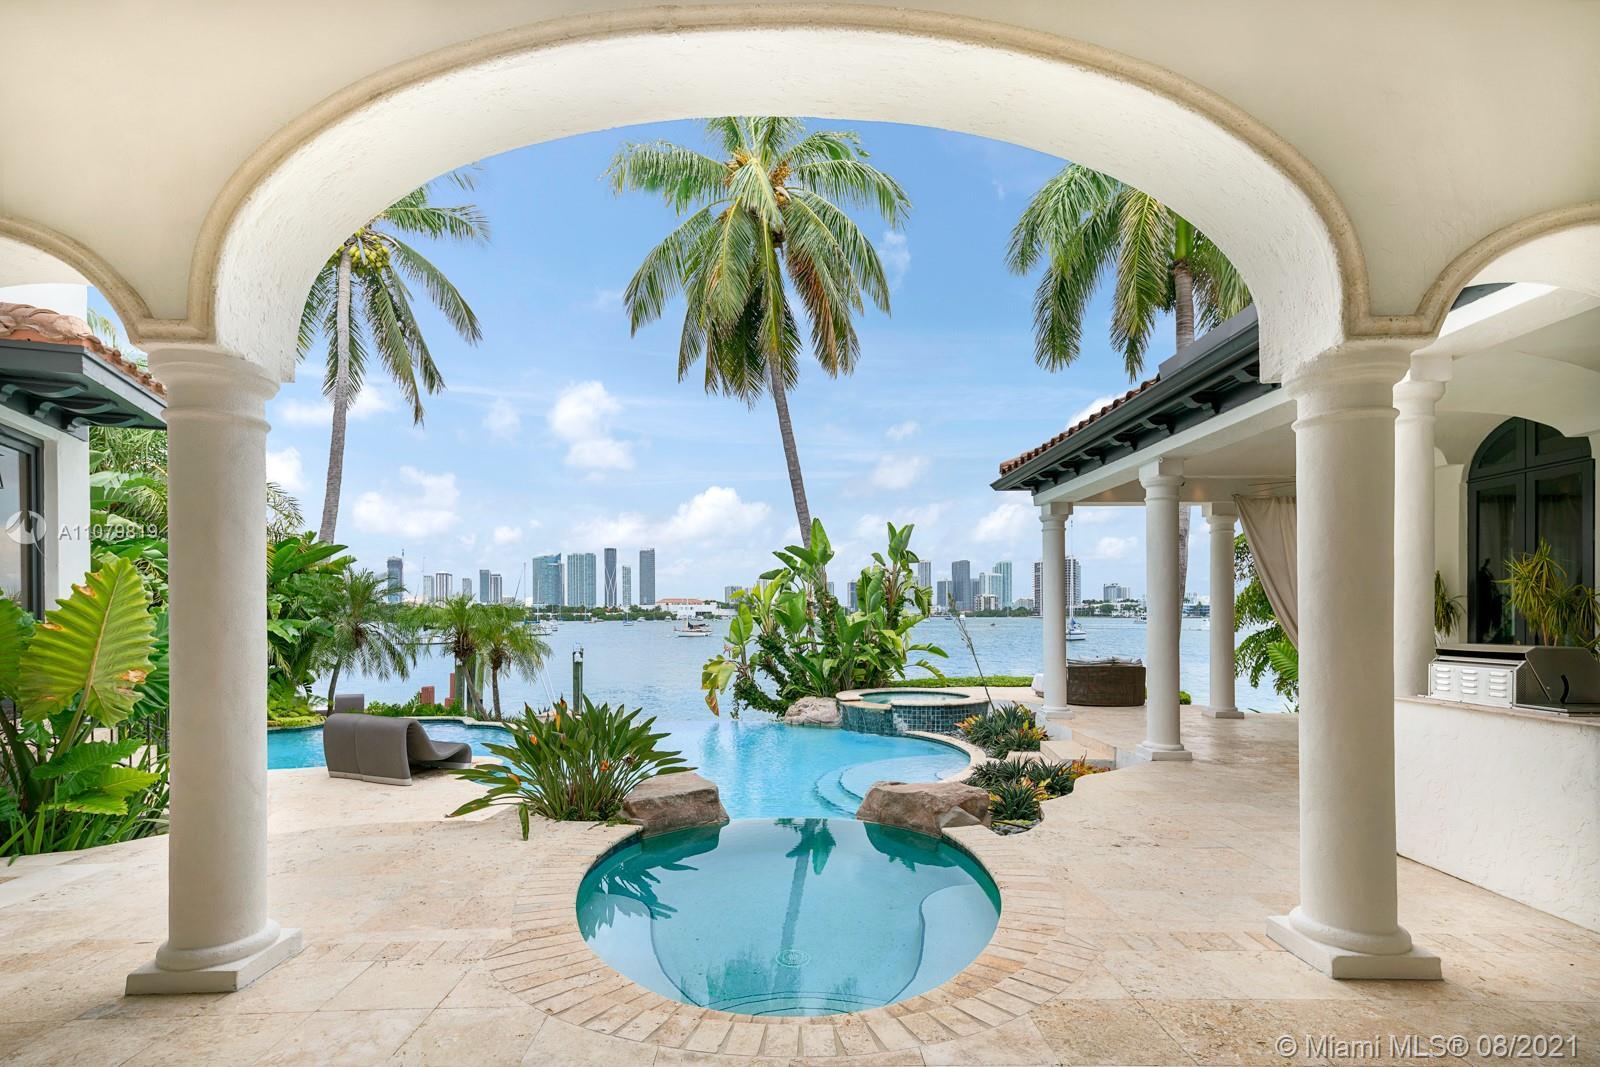 432 S Hibiscus Dr Luxury Real Estate